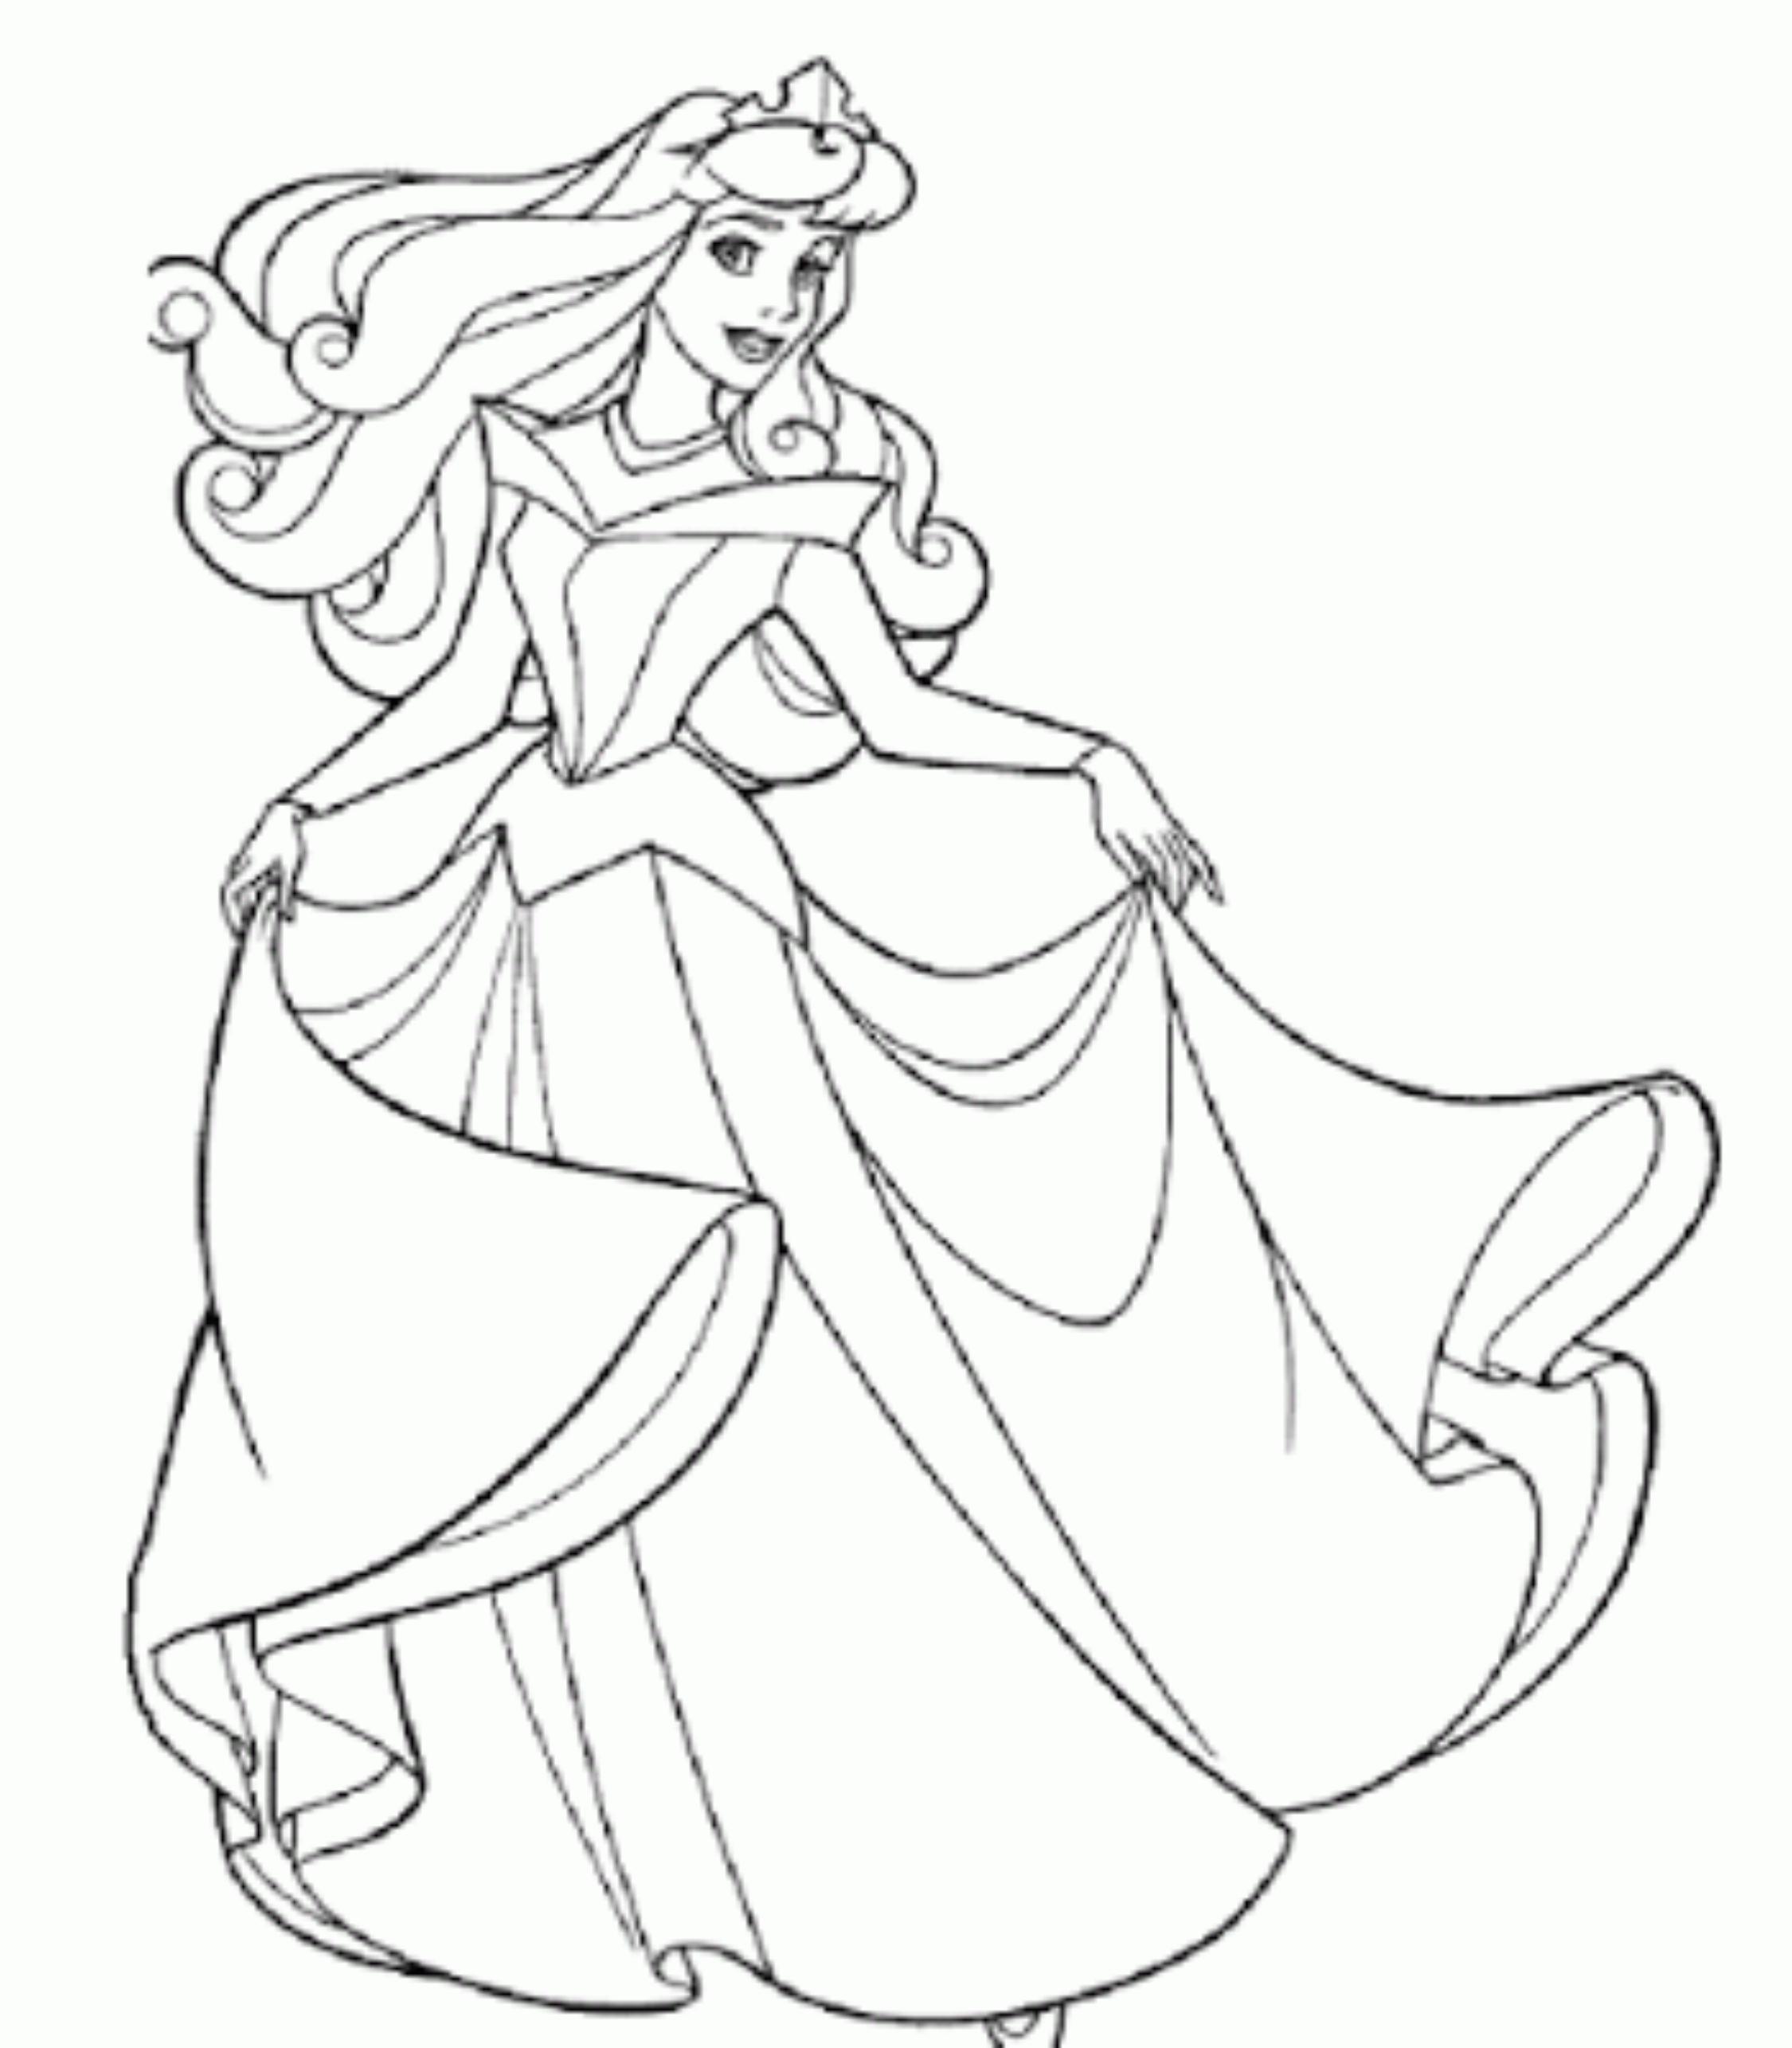 Dibujos Para Colorear De Munecas Gratis Para Ninas